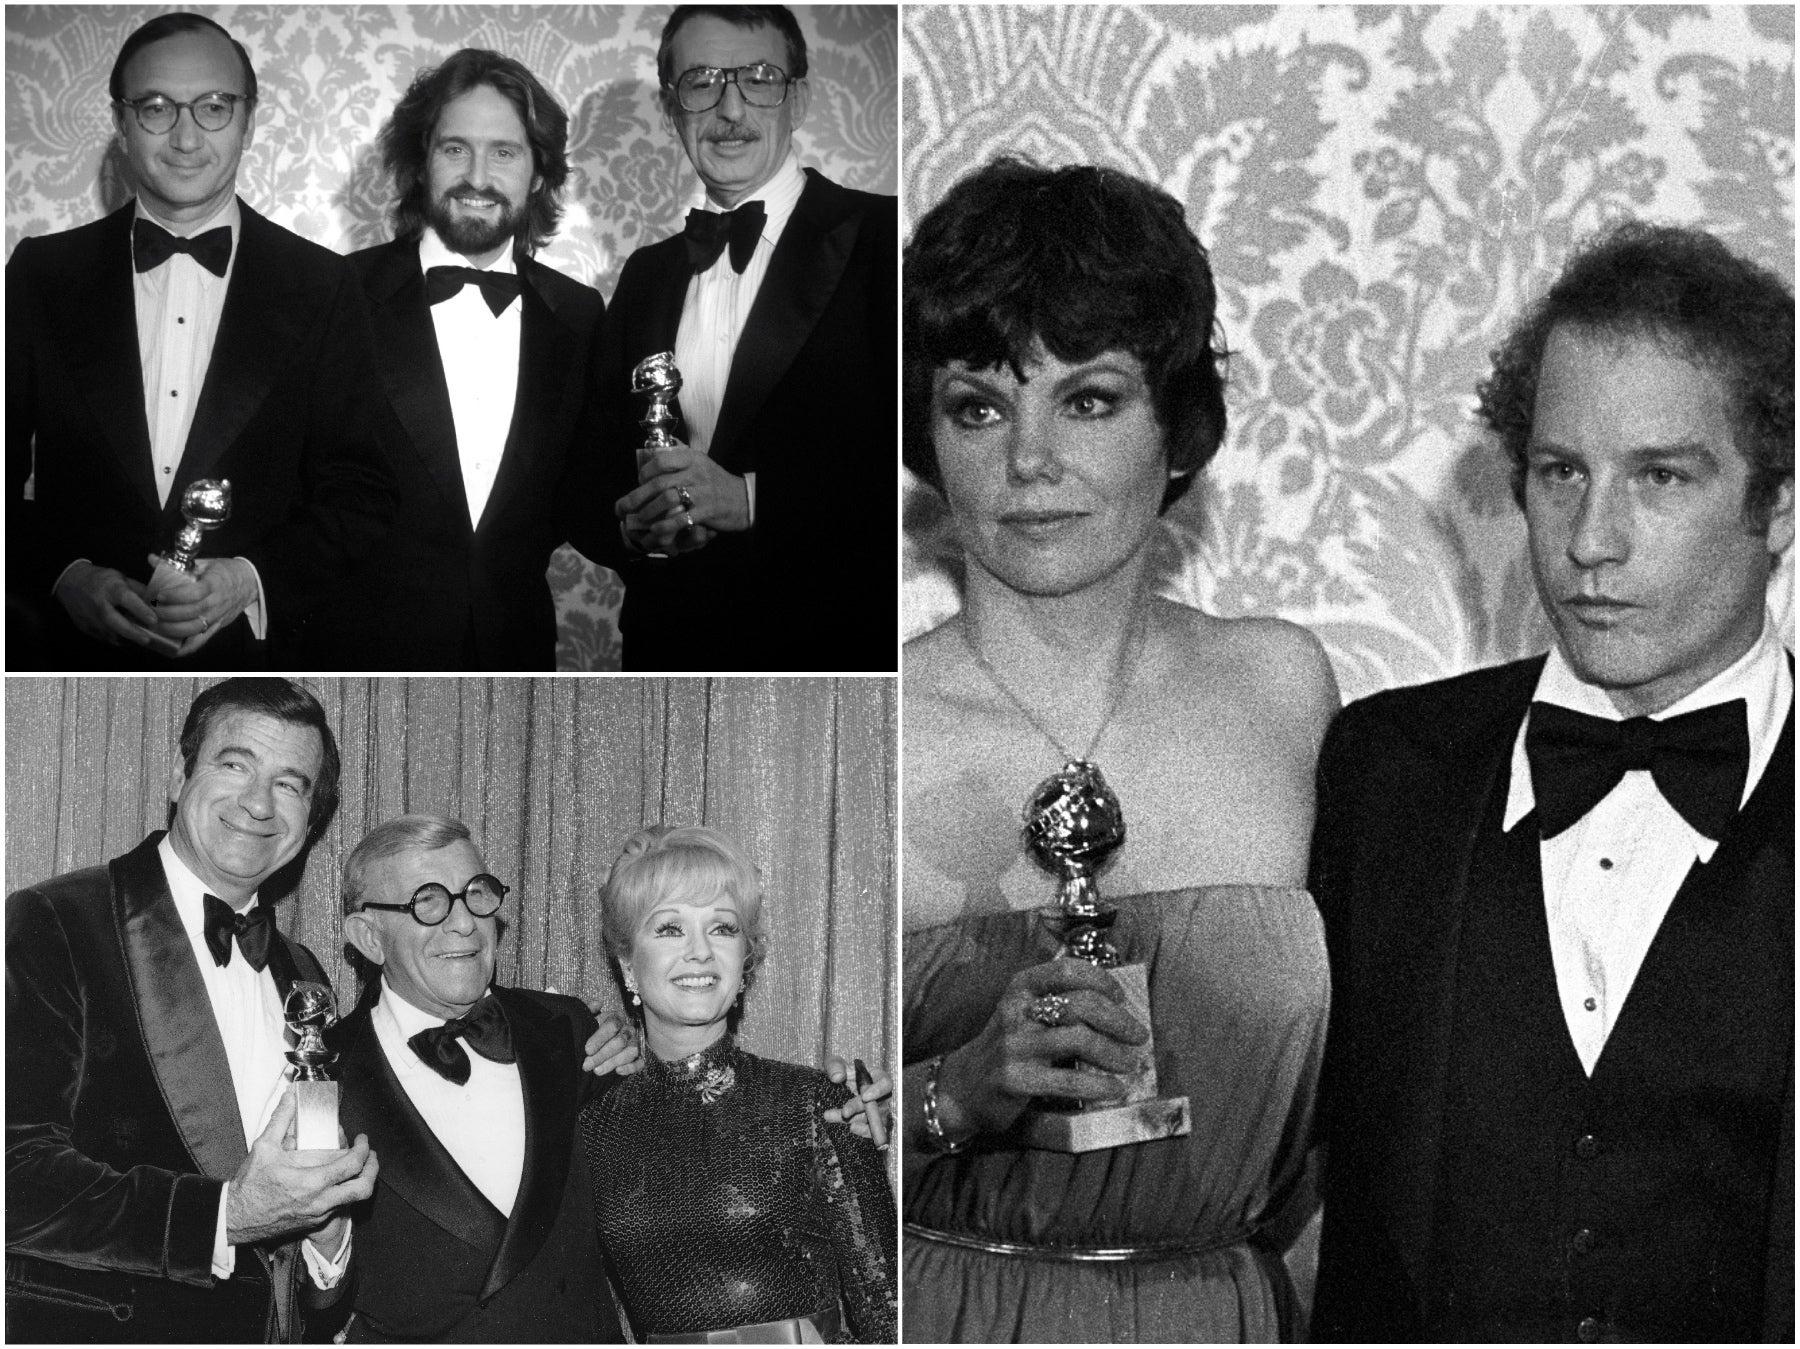 Golden Globe winners with Neil Simon films